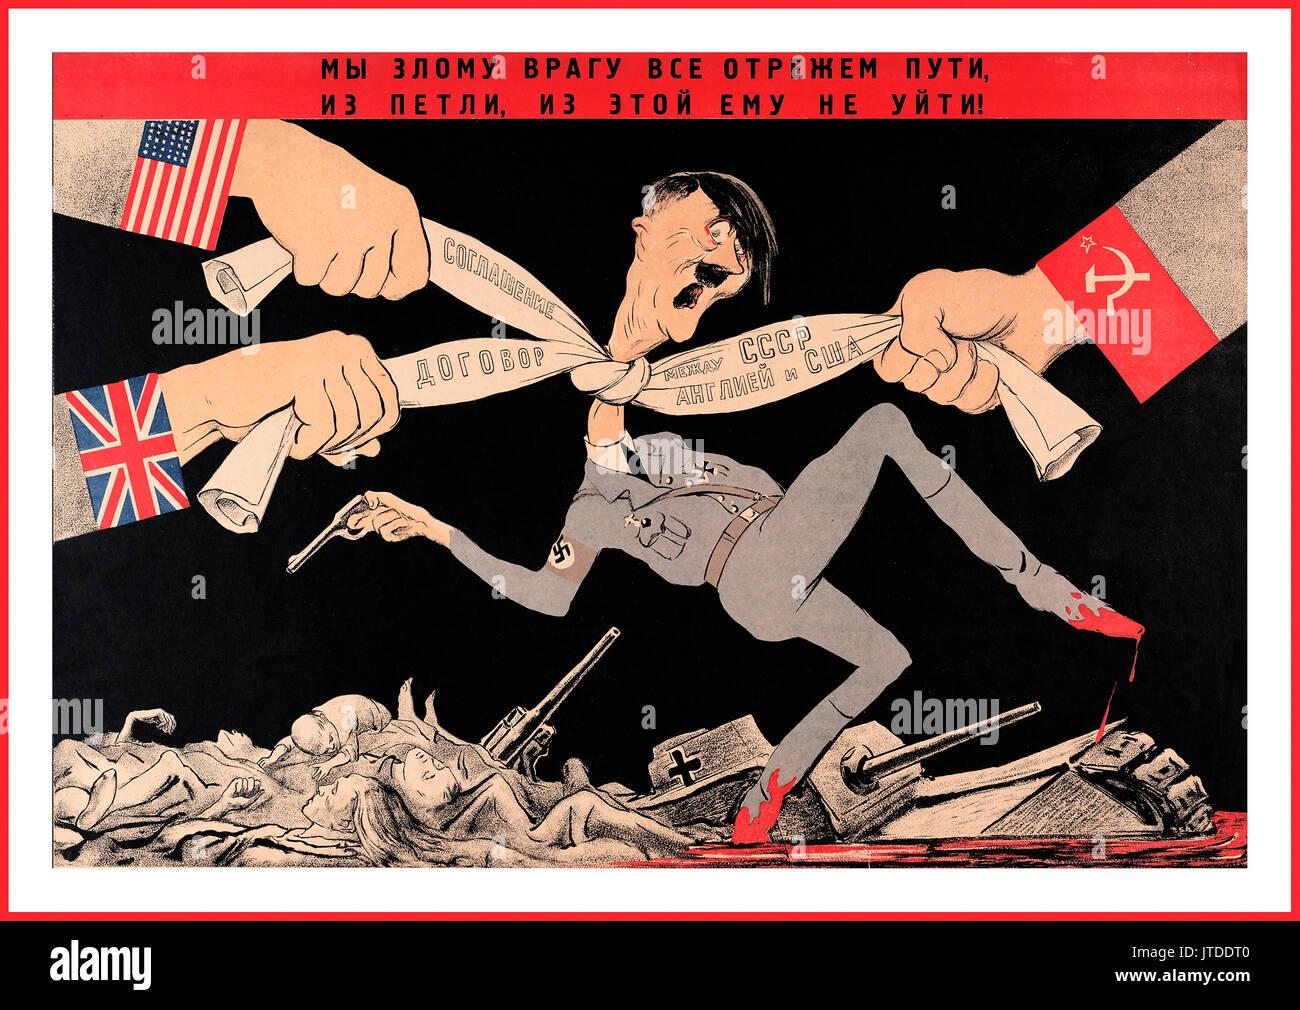 Wwii Poster Hitler Stockfotos & Wwii Poster Hitler Bilder ...